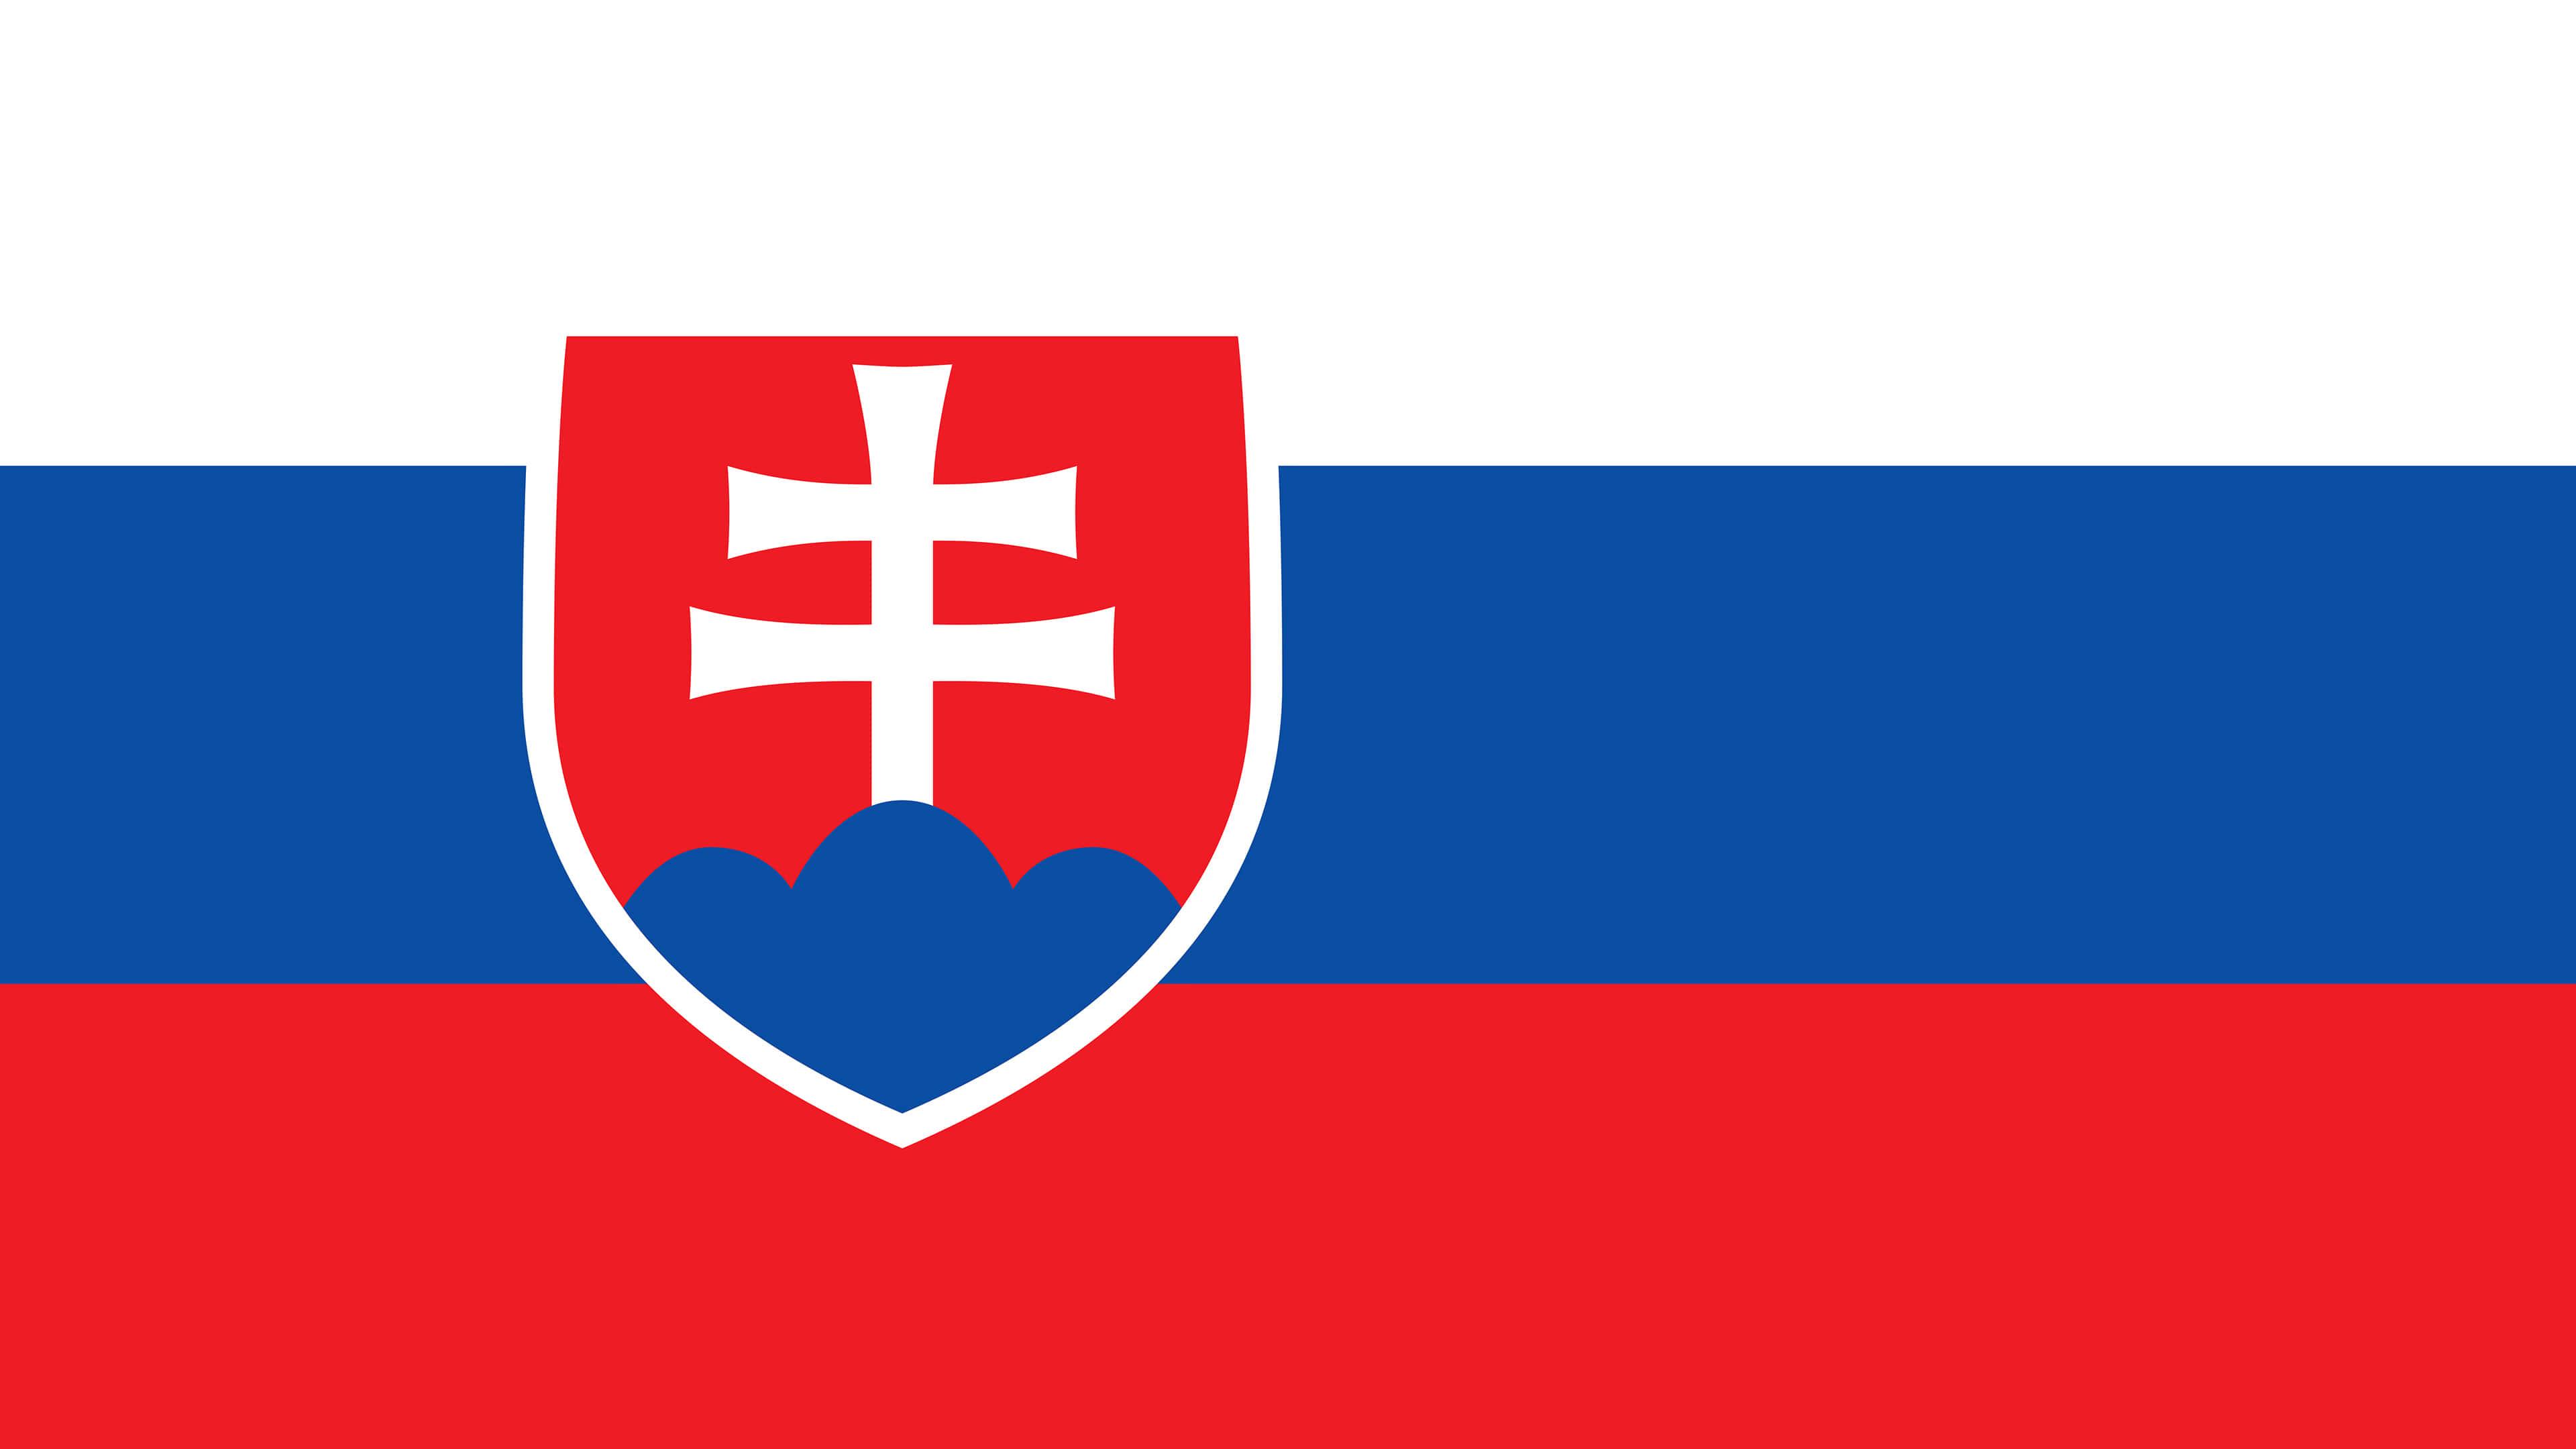 slovakia flag uhd 4k wallpaper